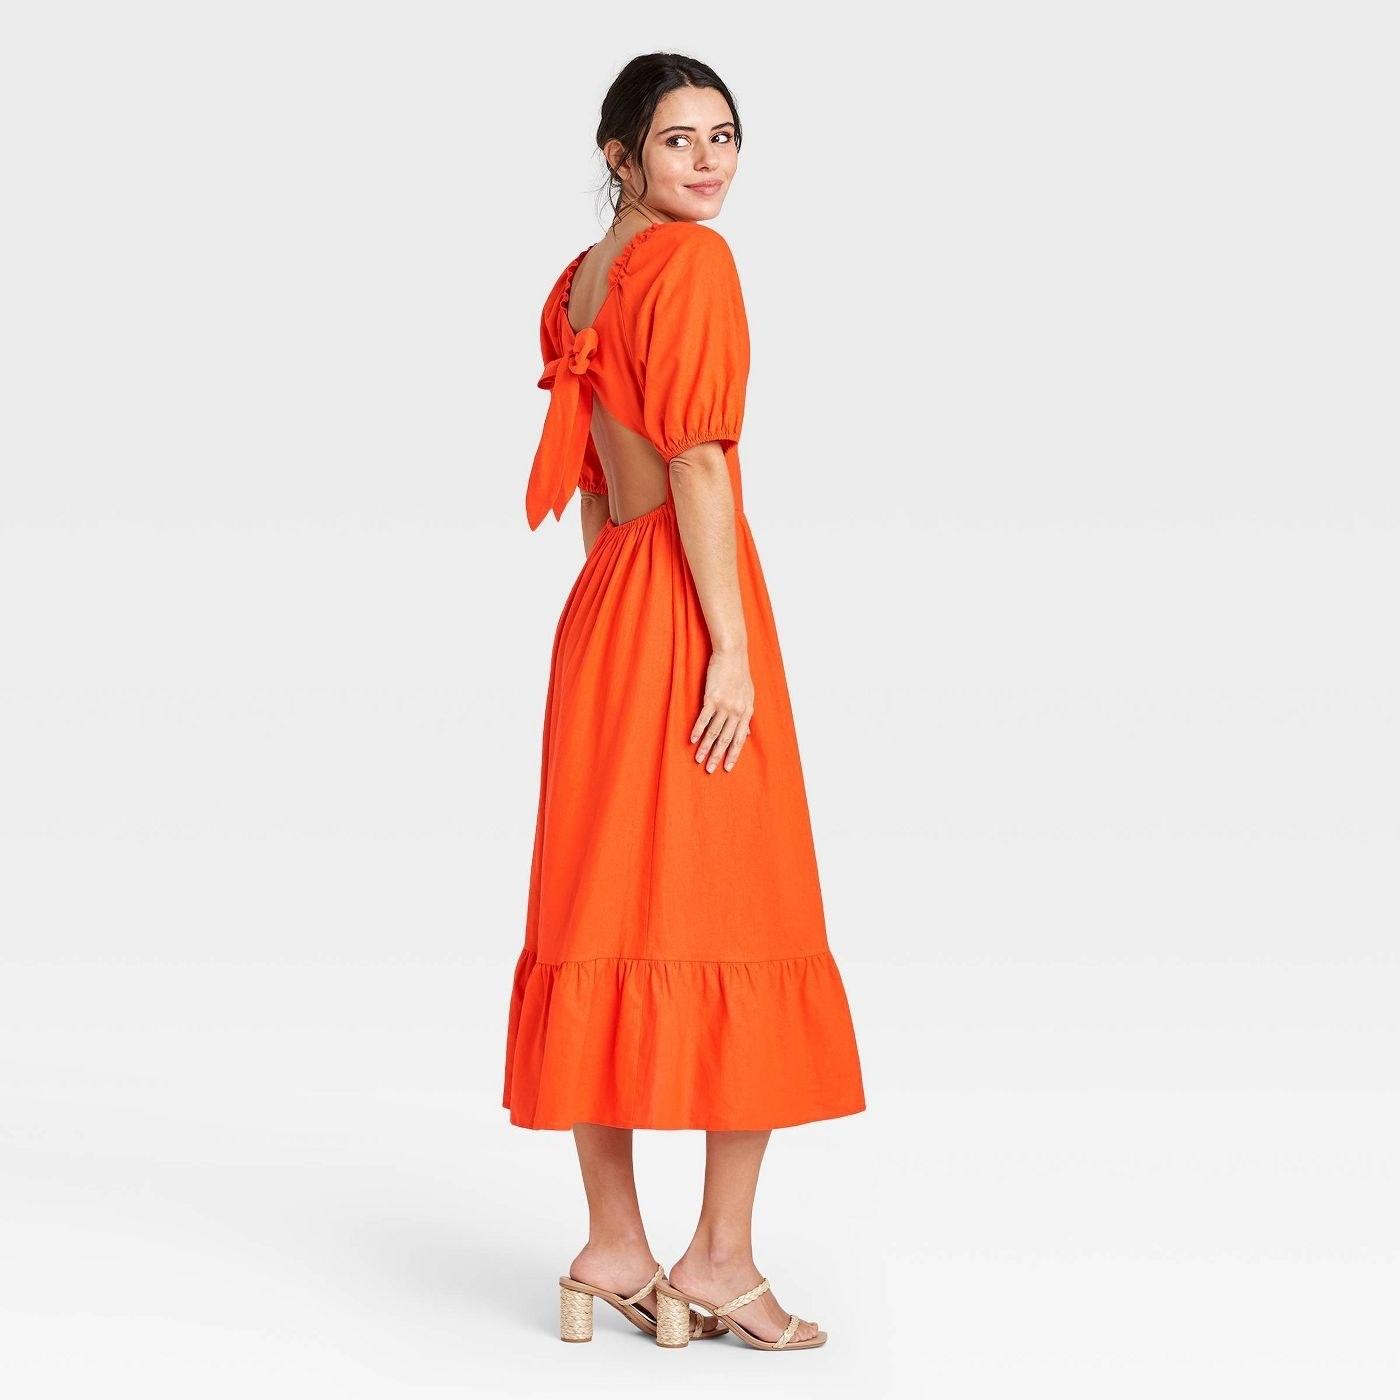 Orange midi dress with ruffle hem skirt, goes past the ankle